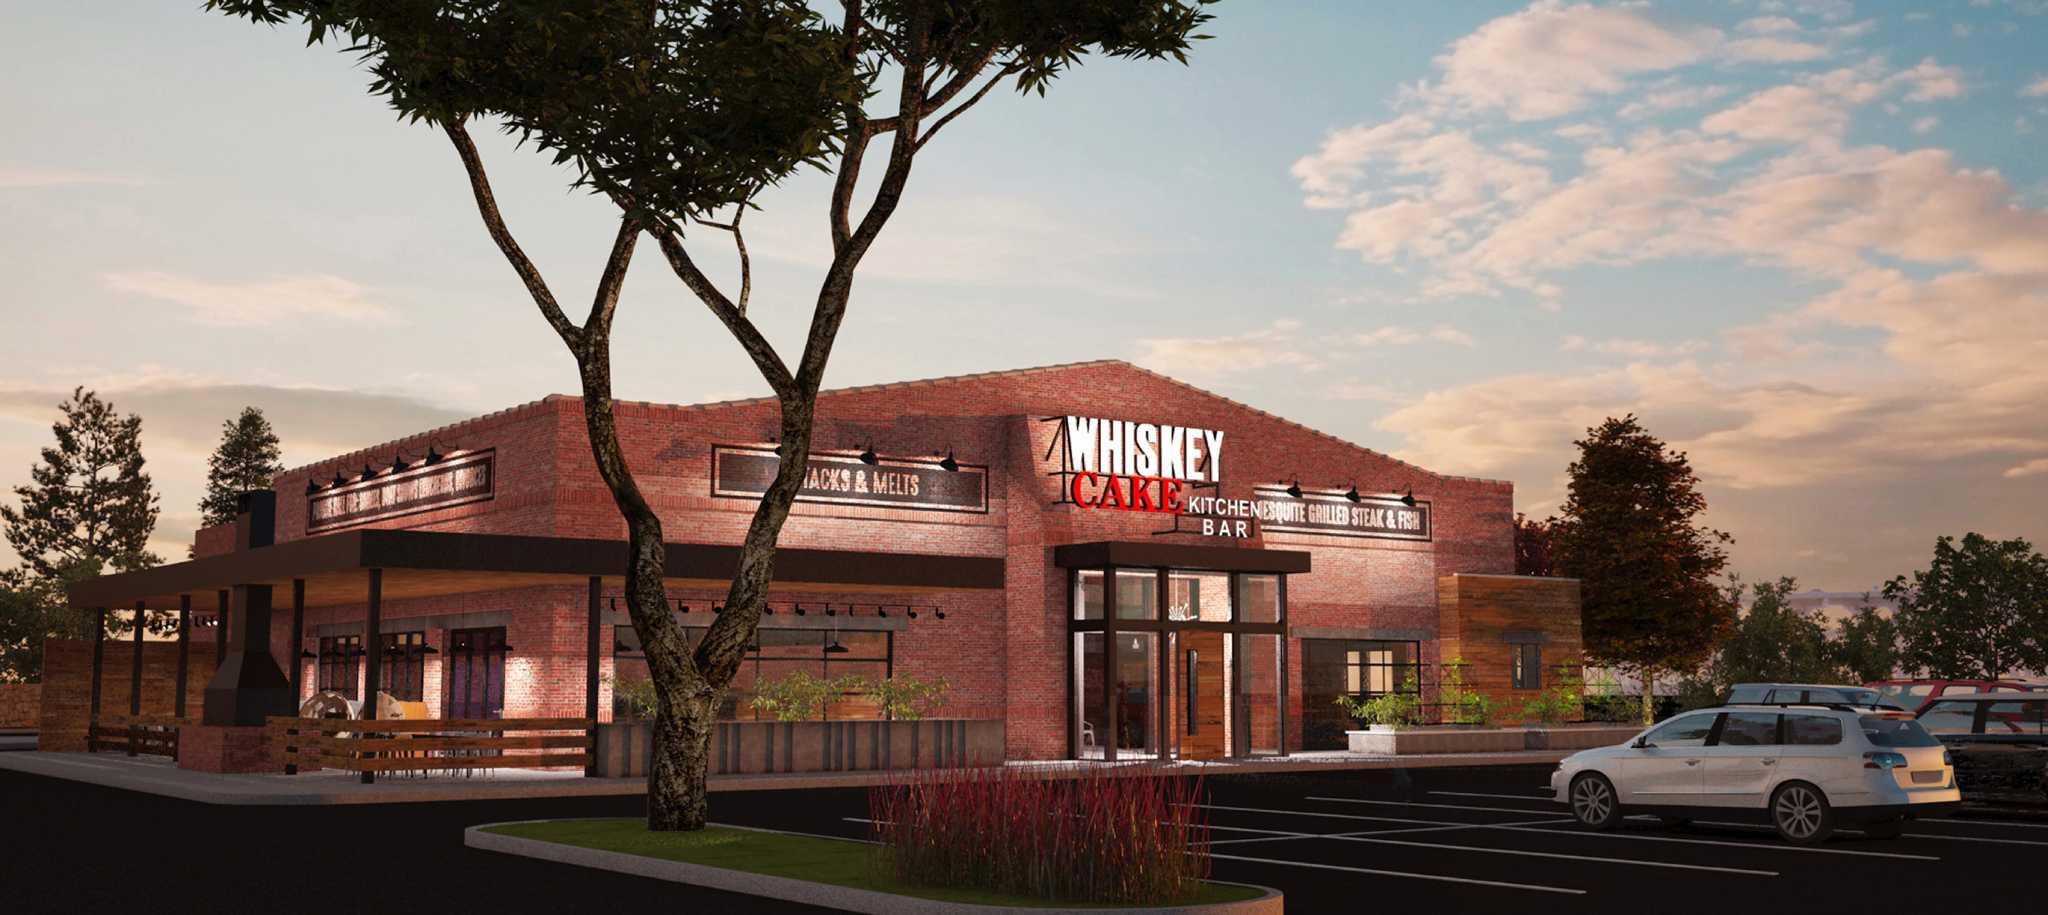 Whiskey Cake Kitchen & Bar buys land for restaurant in Katy ...